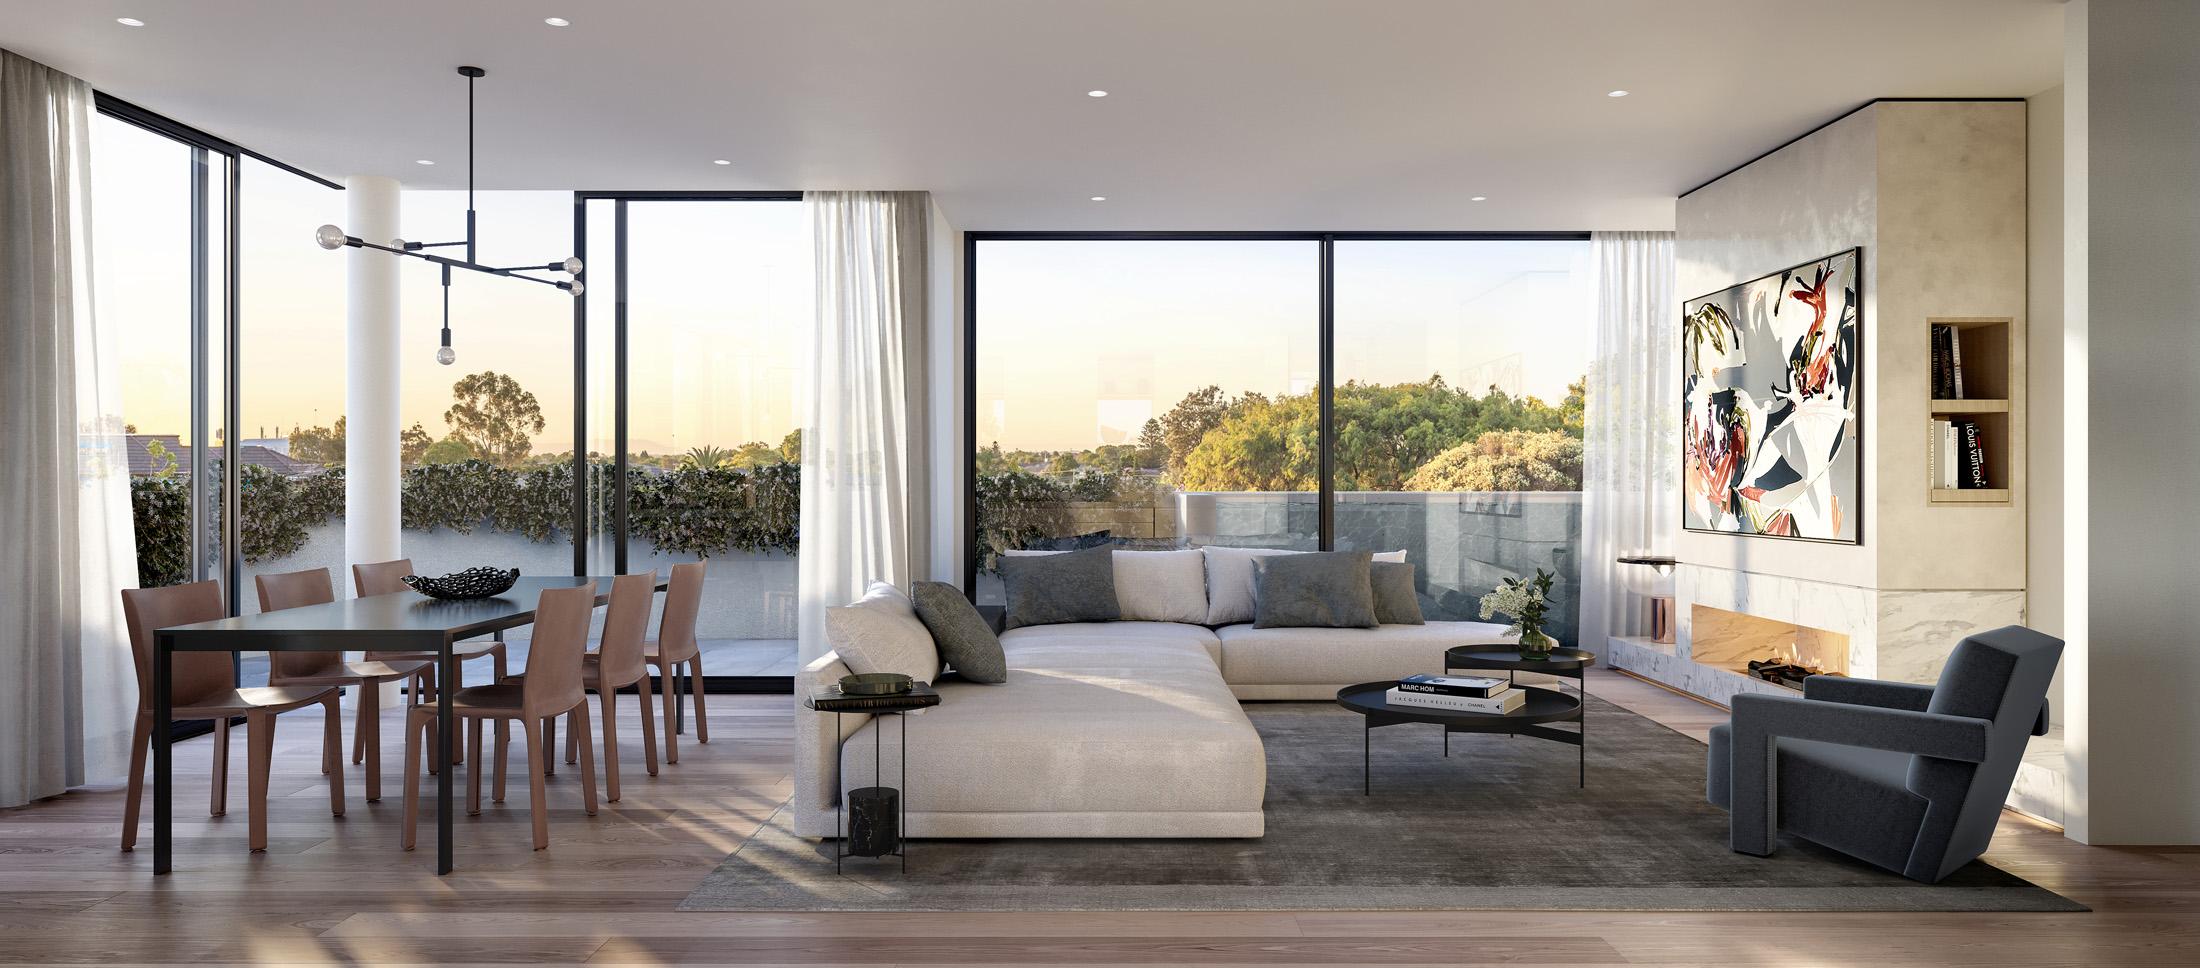 Trentham-House-interiors-sandringham-Melbourne-3d-image-visualisation